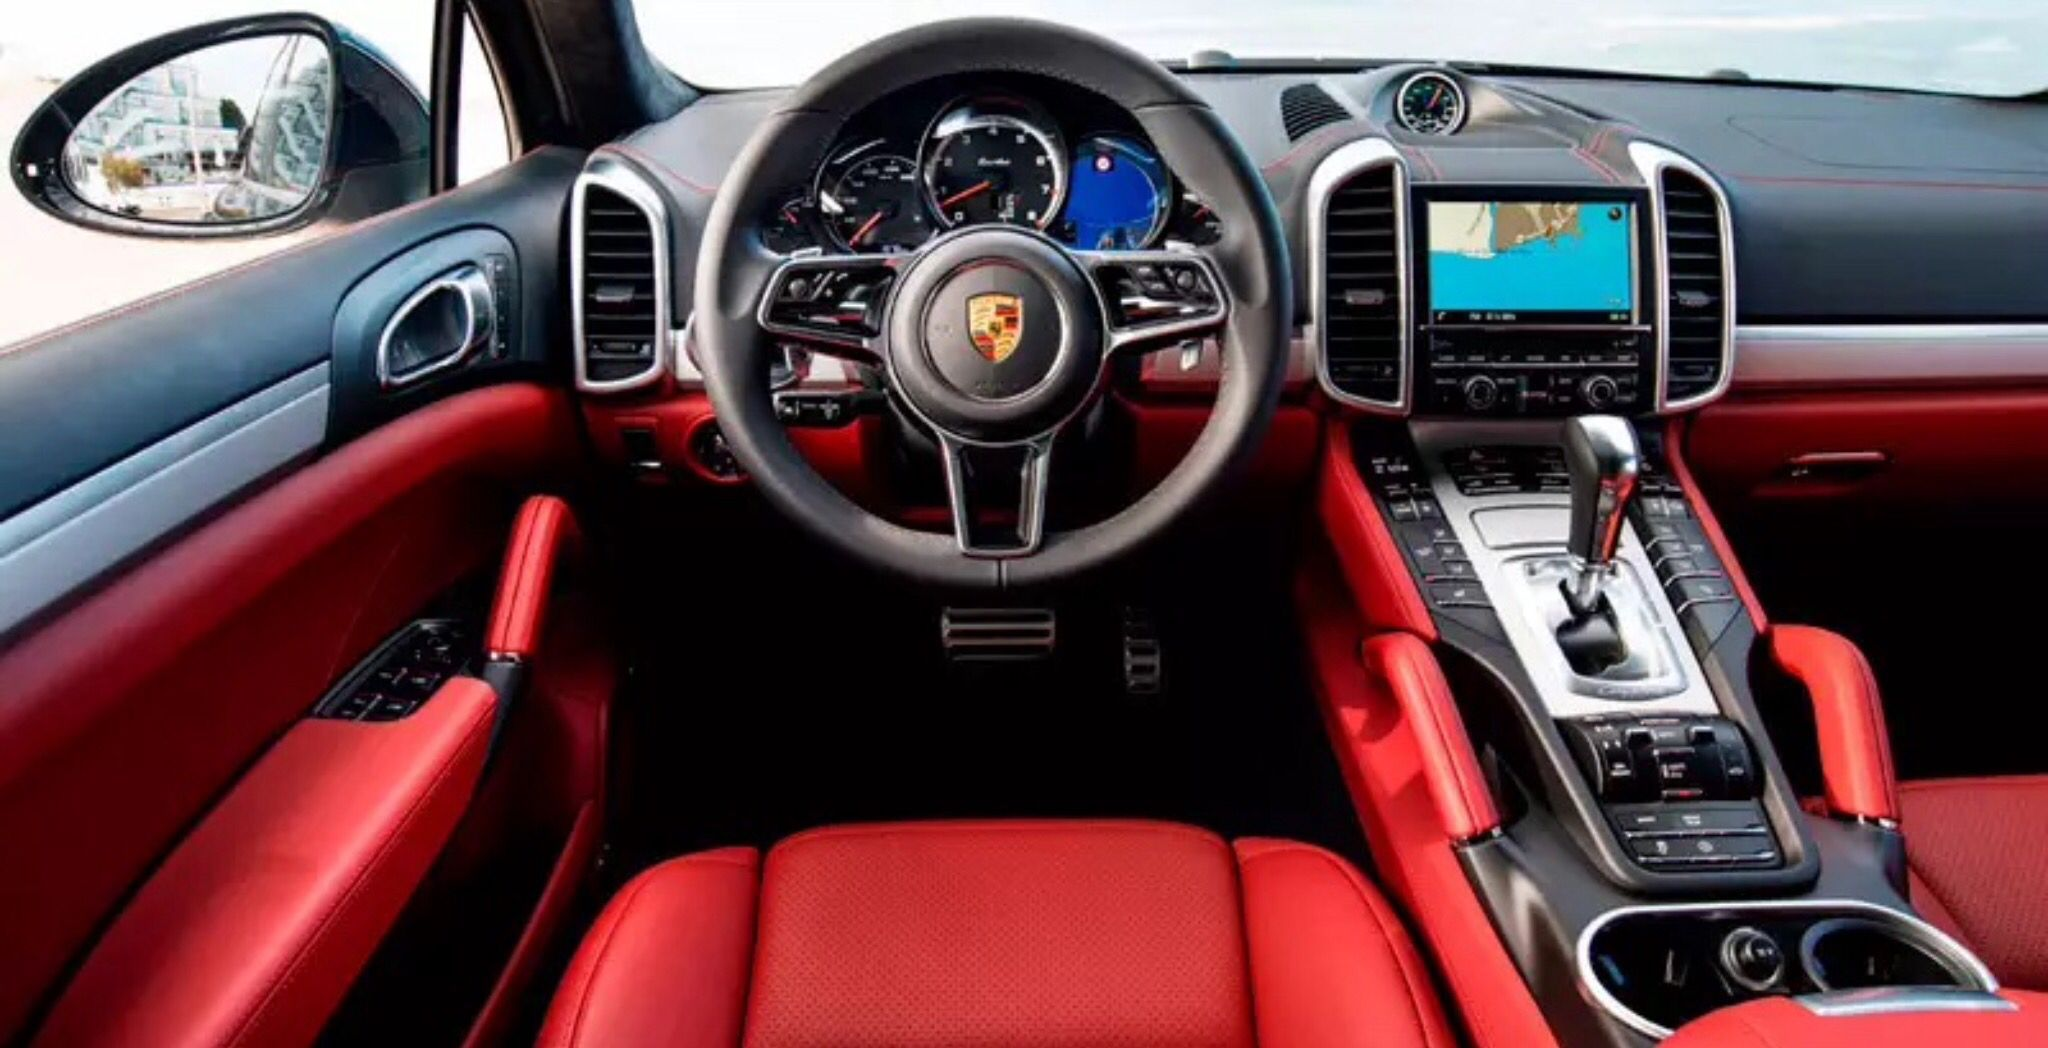 2015 porsche cayenne turbo s interior love the red interior